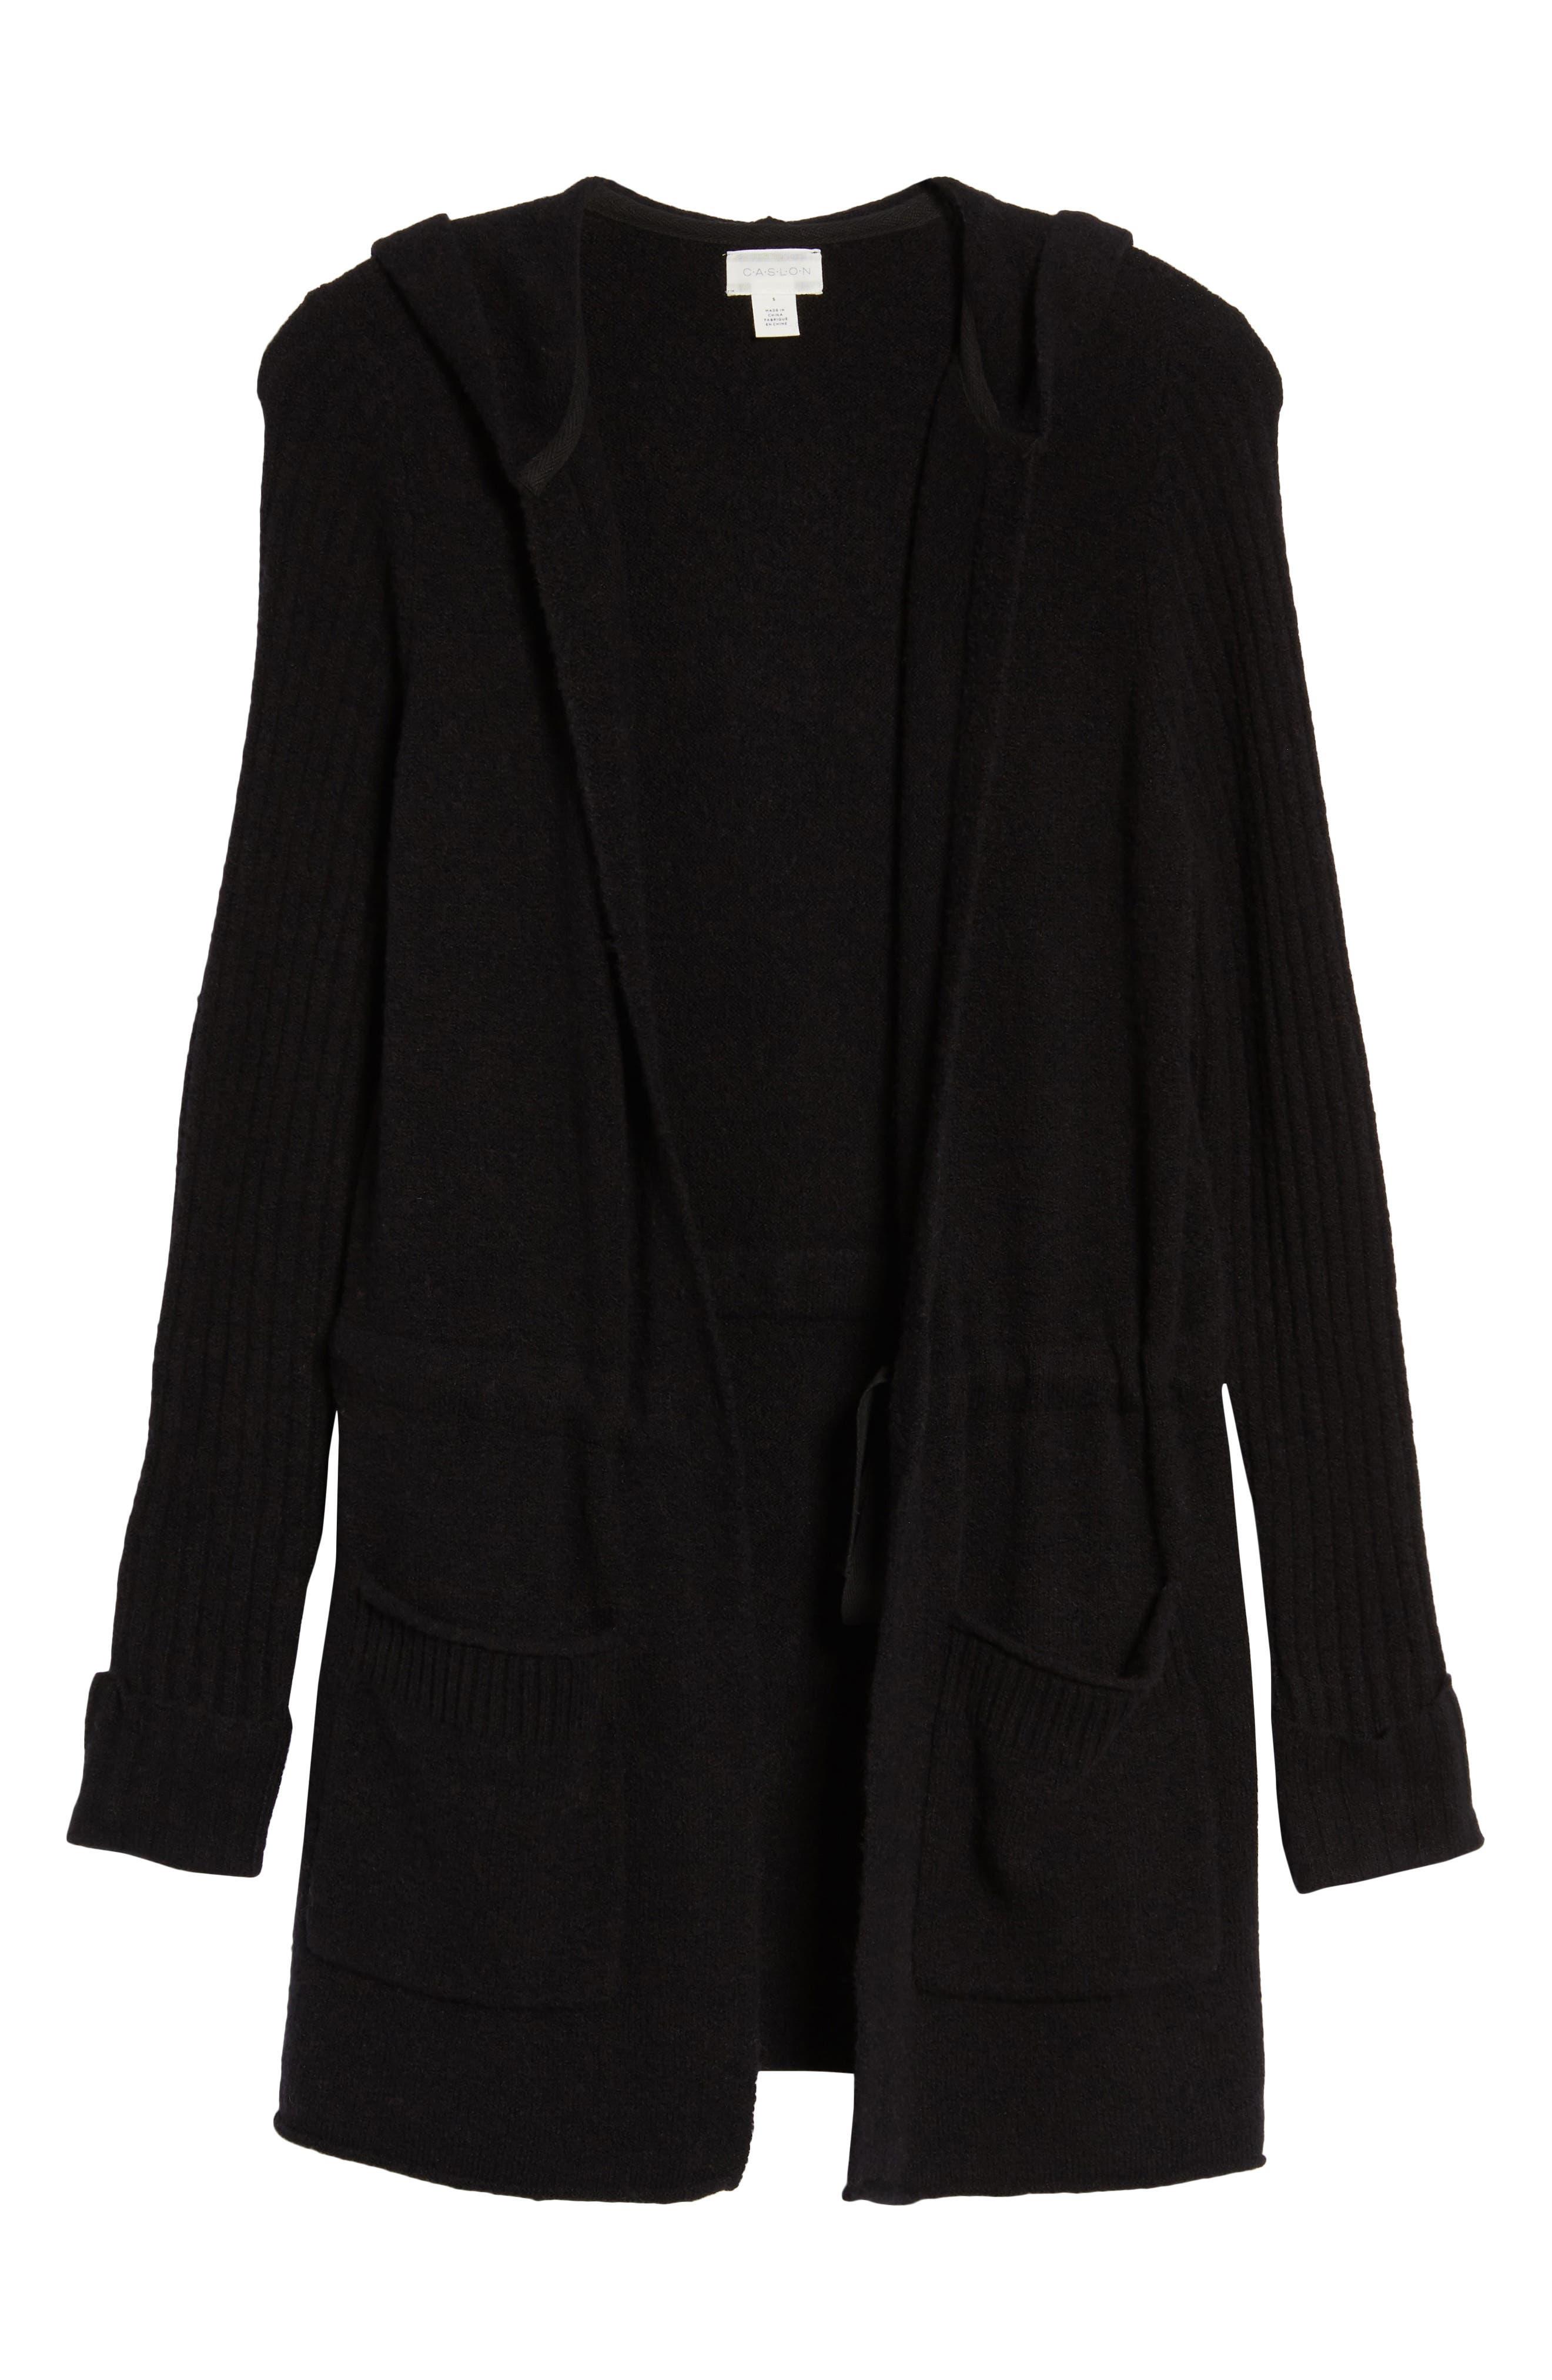 CASLON<SUP>®</SUP>, Hooded Cardigan, Alternate thumbnail 6, color, BLACK